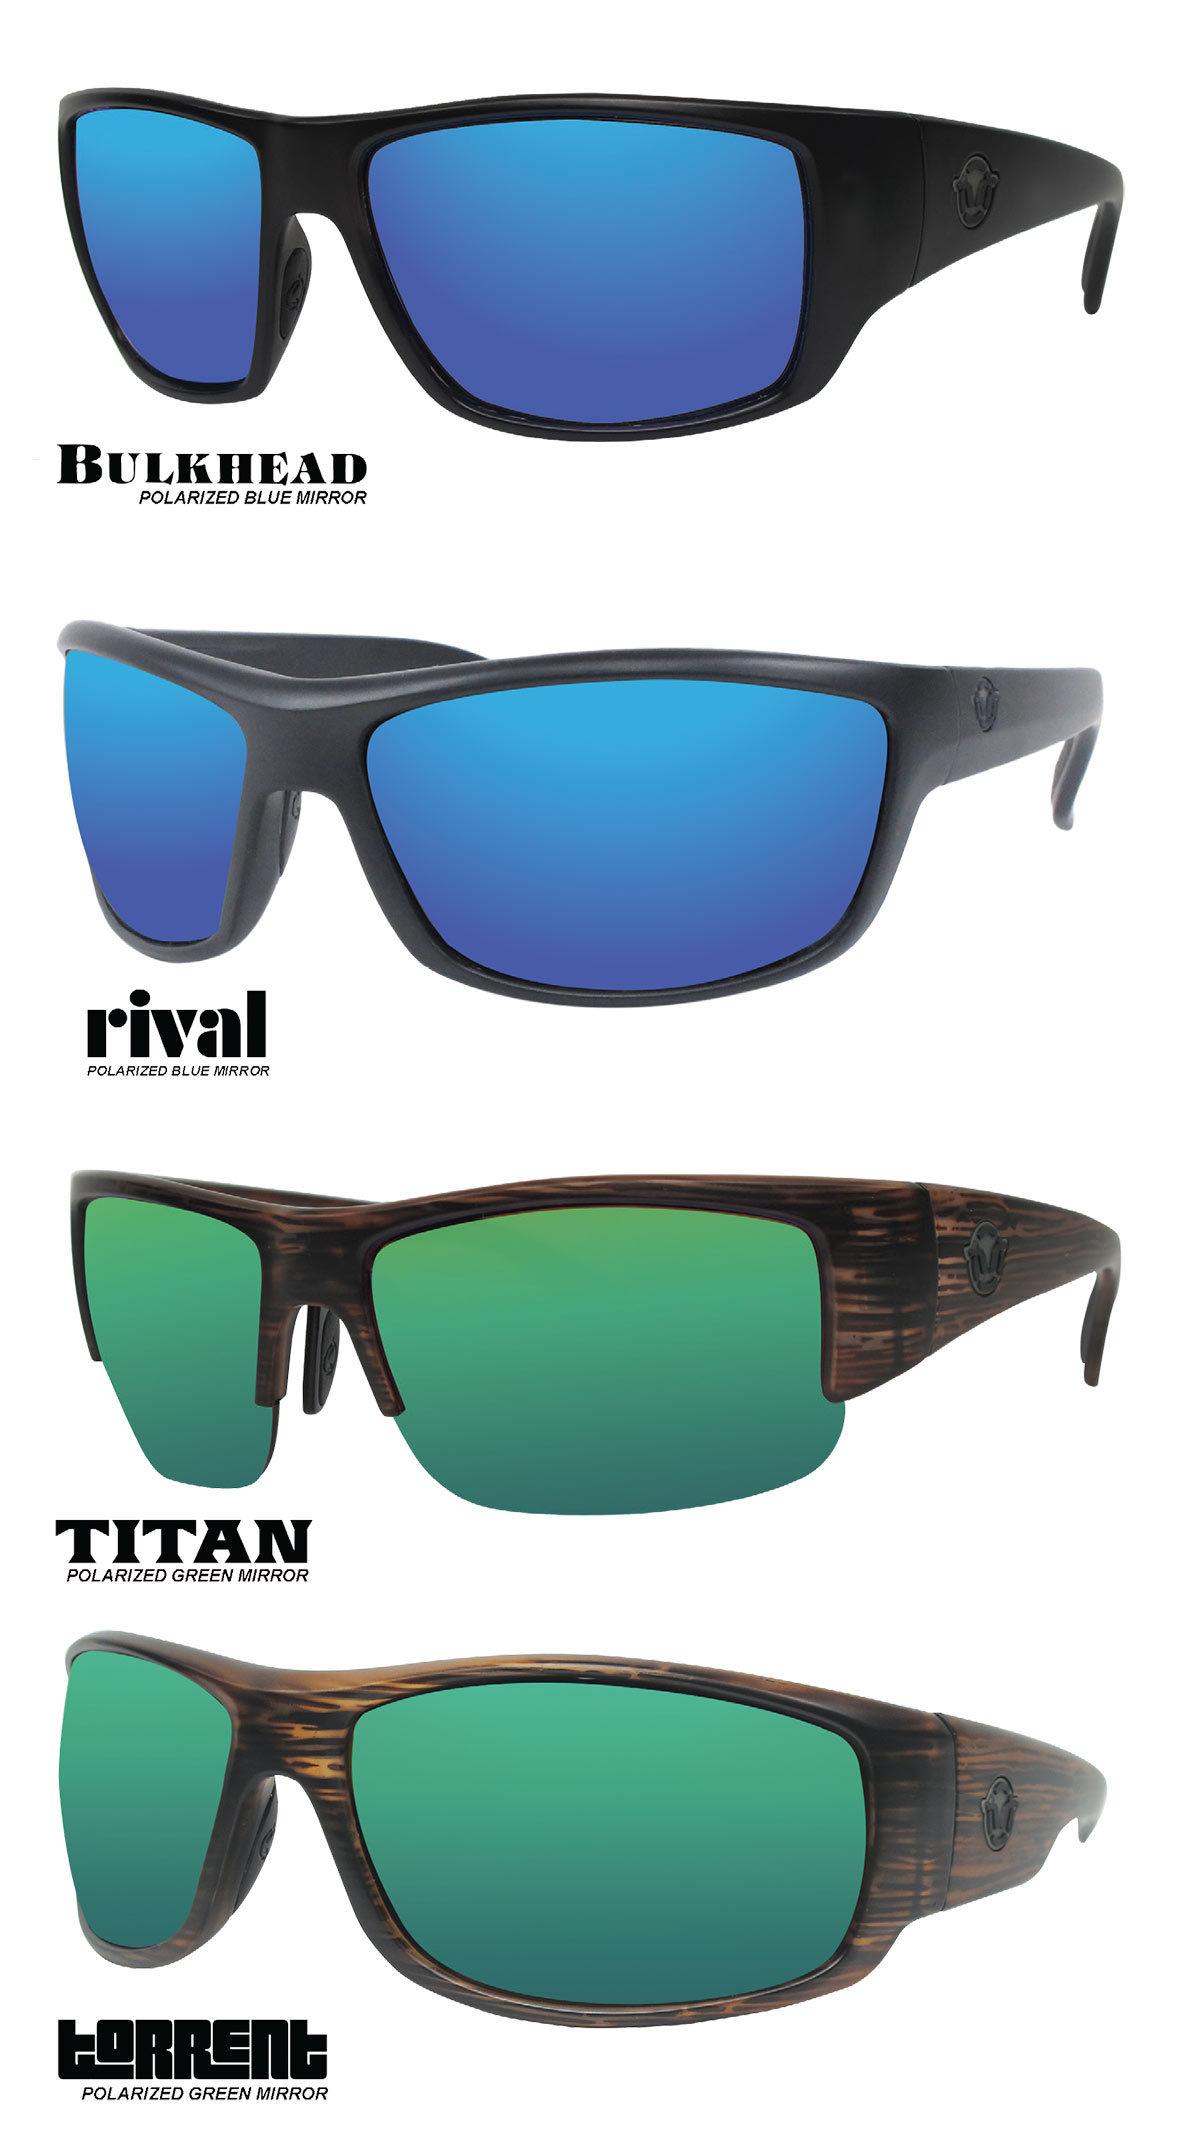 2019 4 Unsinkable Polarized Mirror Sunglasses